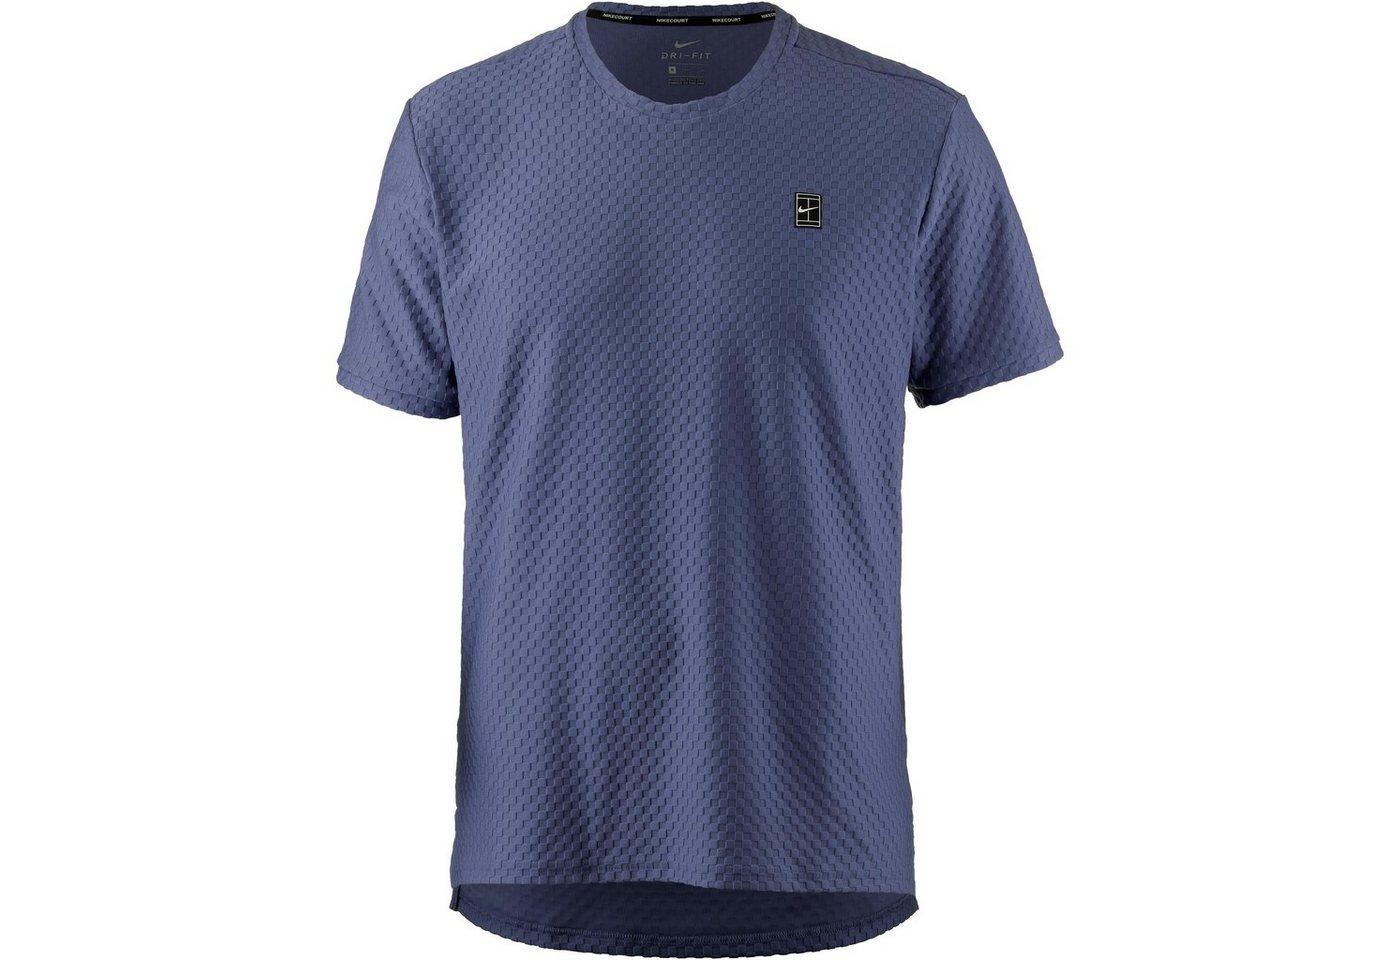 Nike Tennisshirt | Sportbekleidung > Sportshirts > Tennisshirts | Blau | Polyester - Elastan | Nike